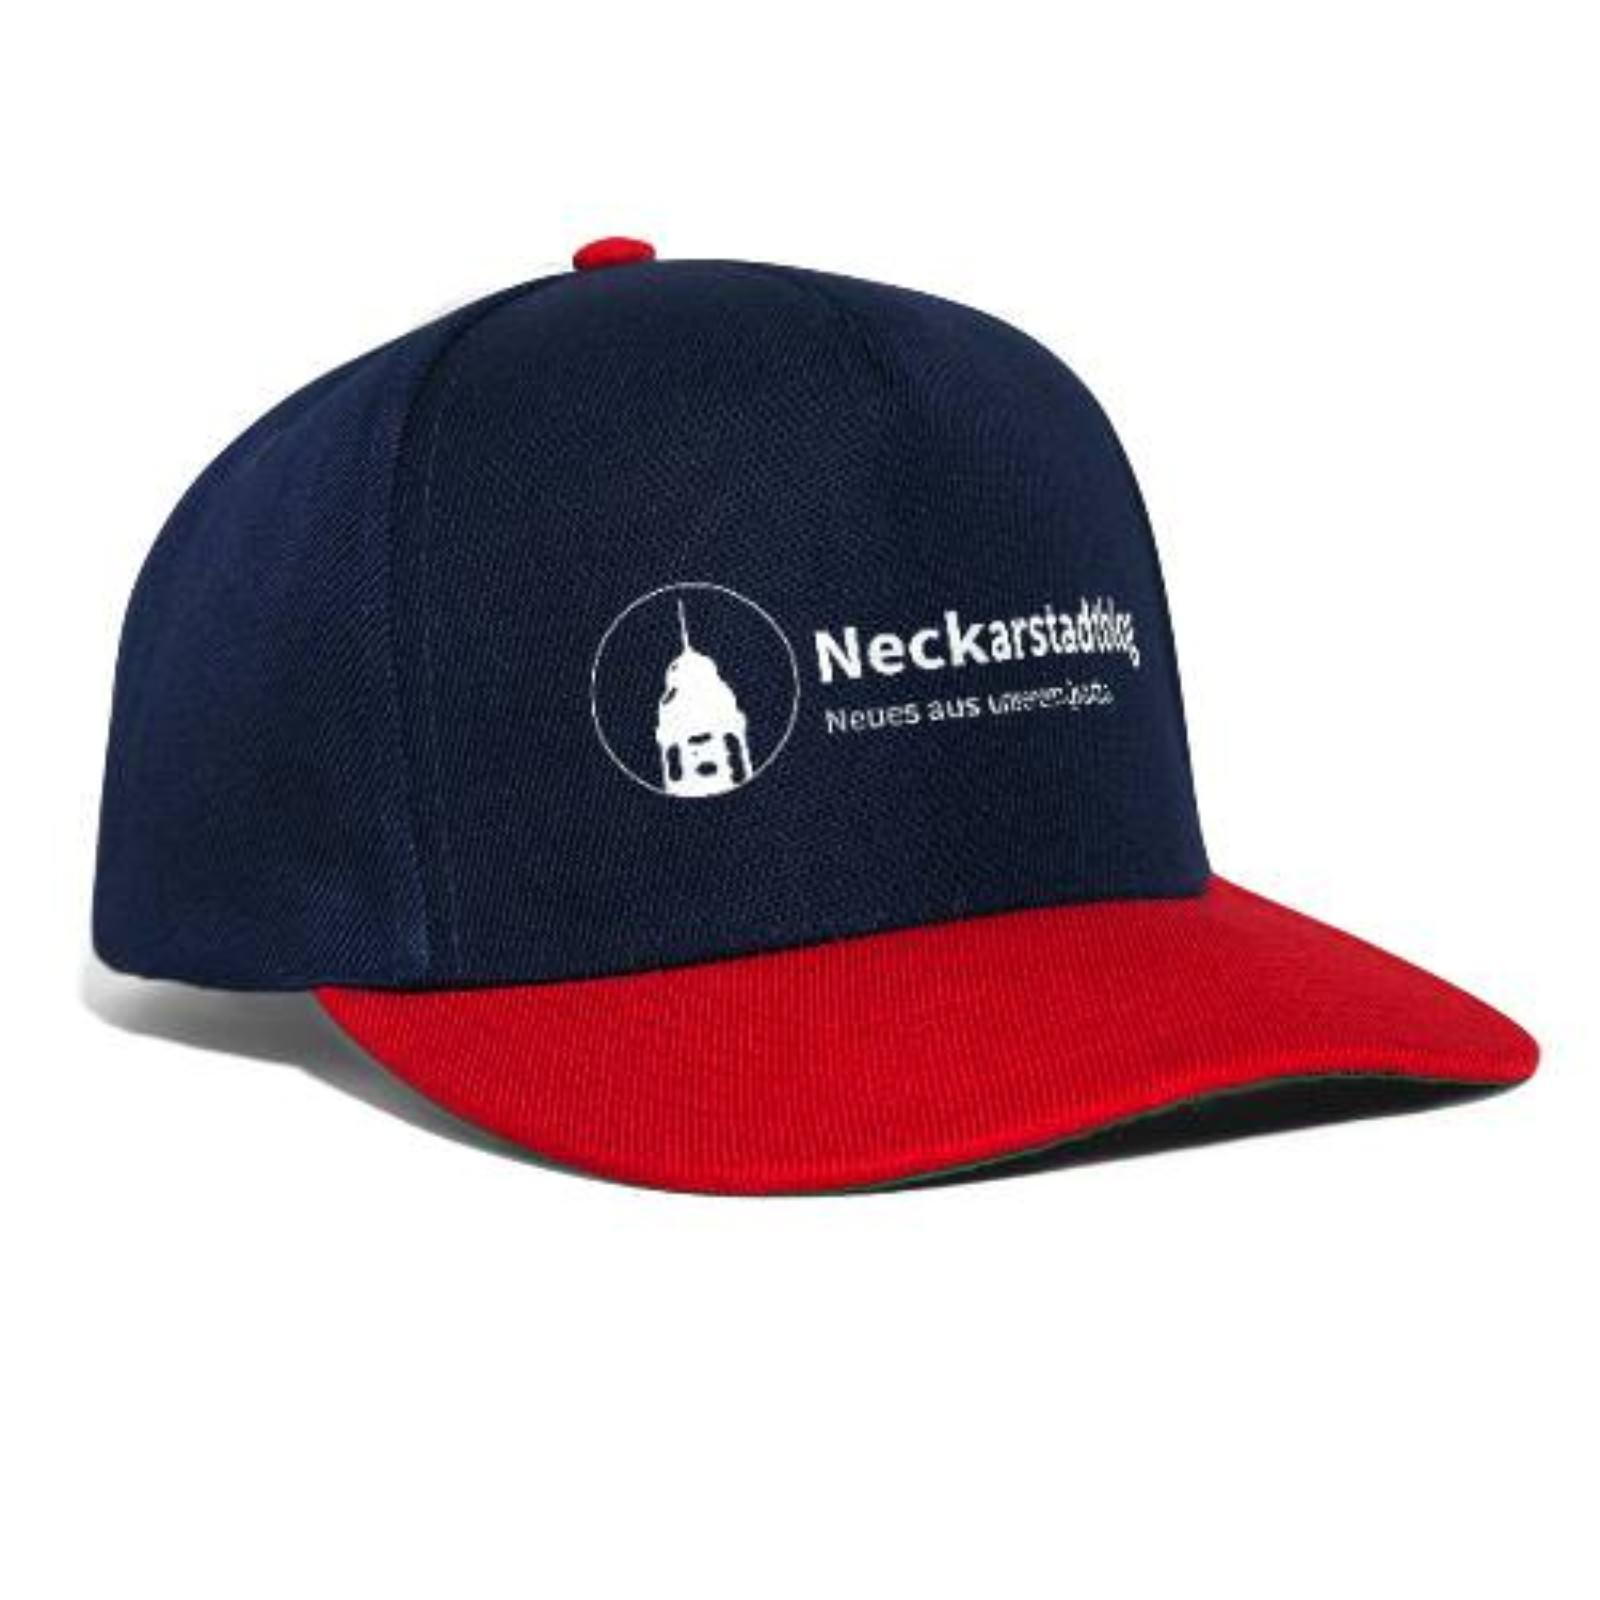 neckarstadtblog-logo-claim-snapback-cap